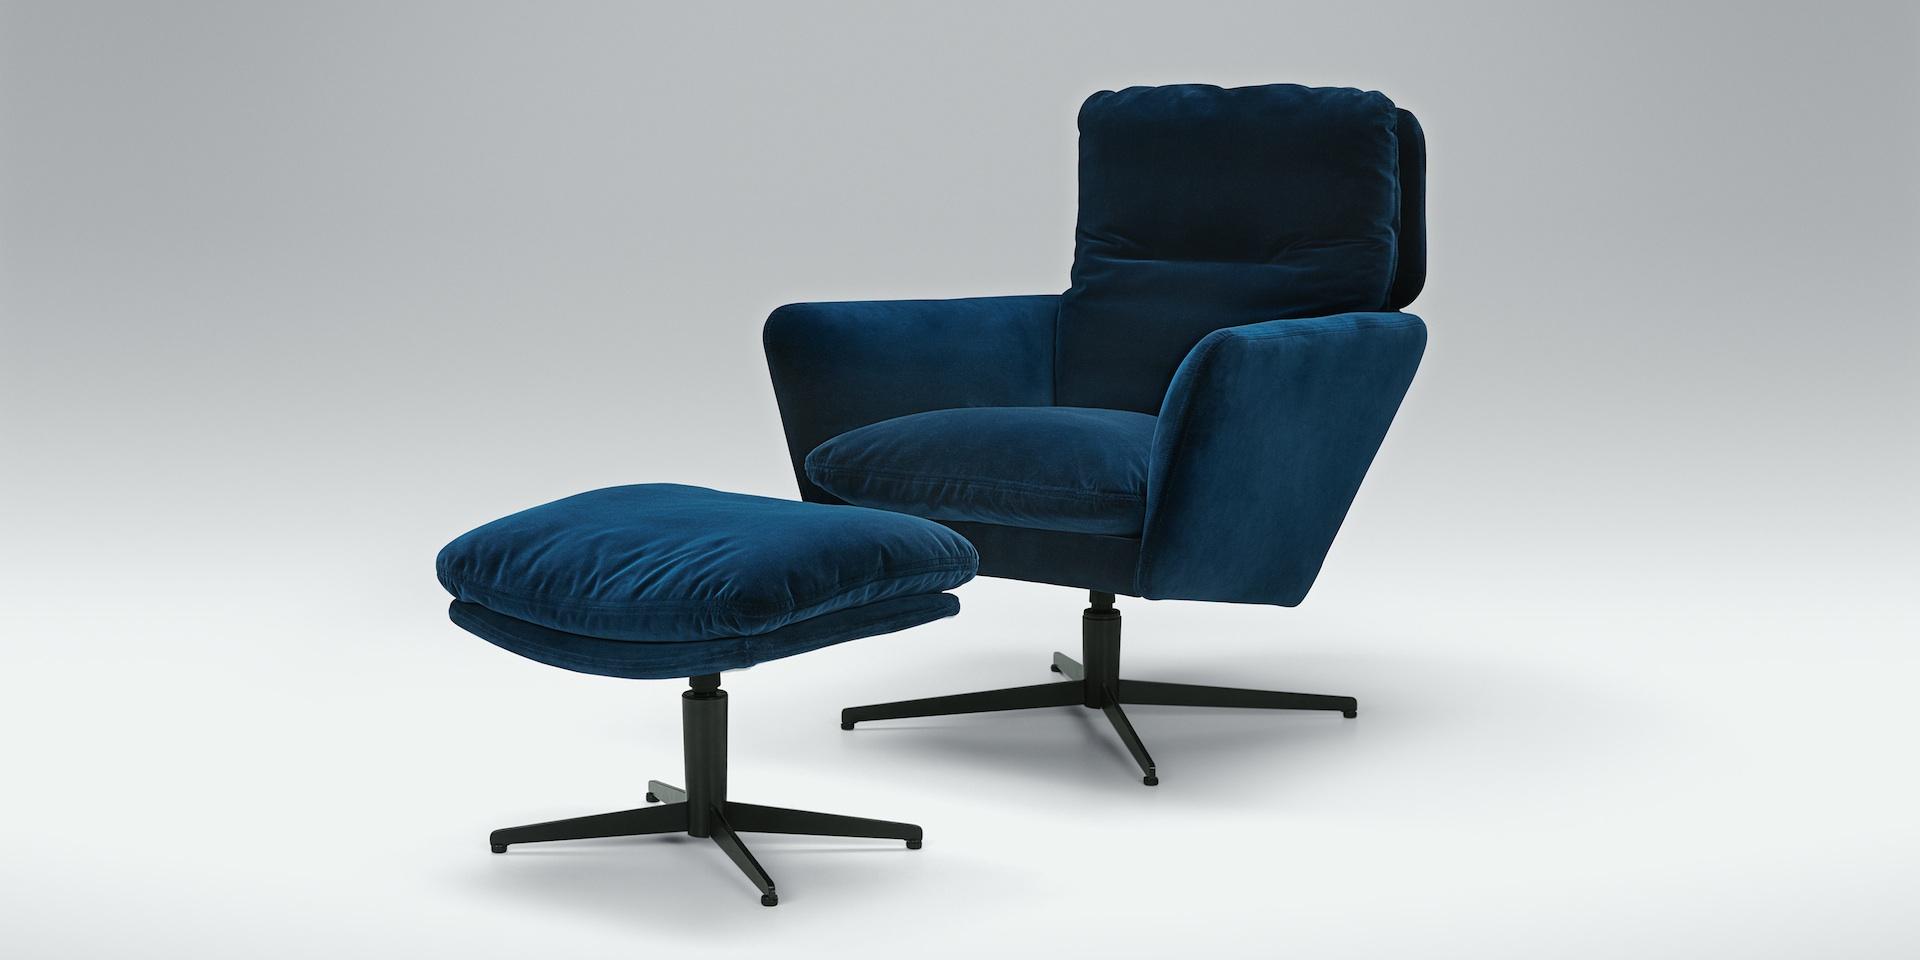 AMY_shadow_armchair_footstool_lario54_dark_blue_2